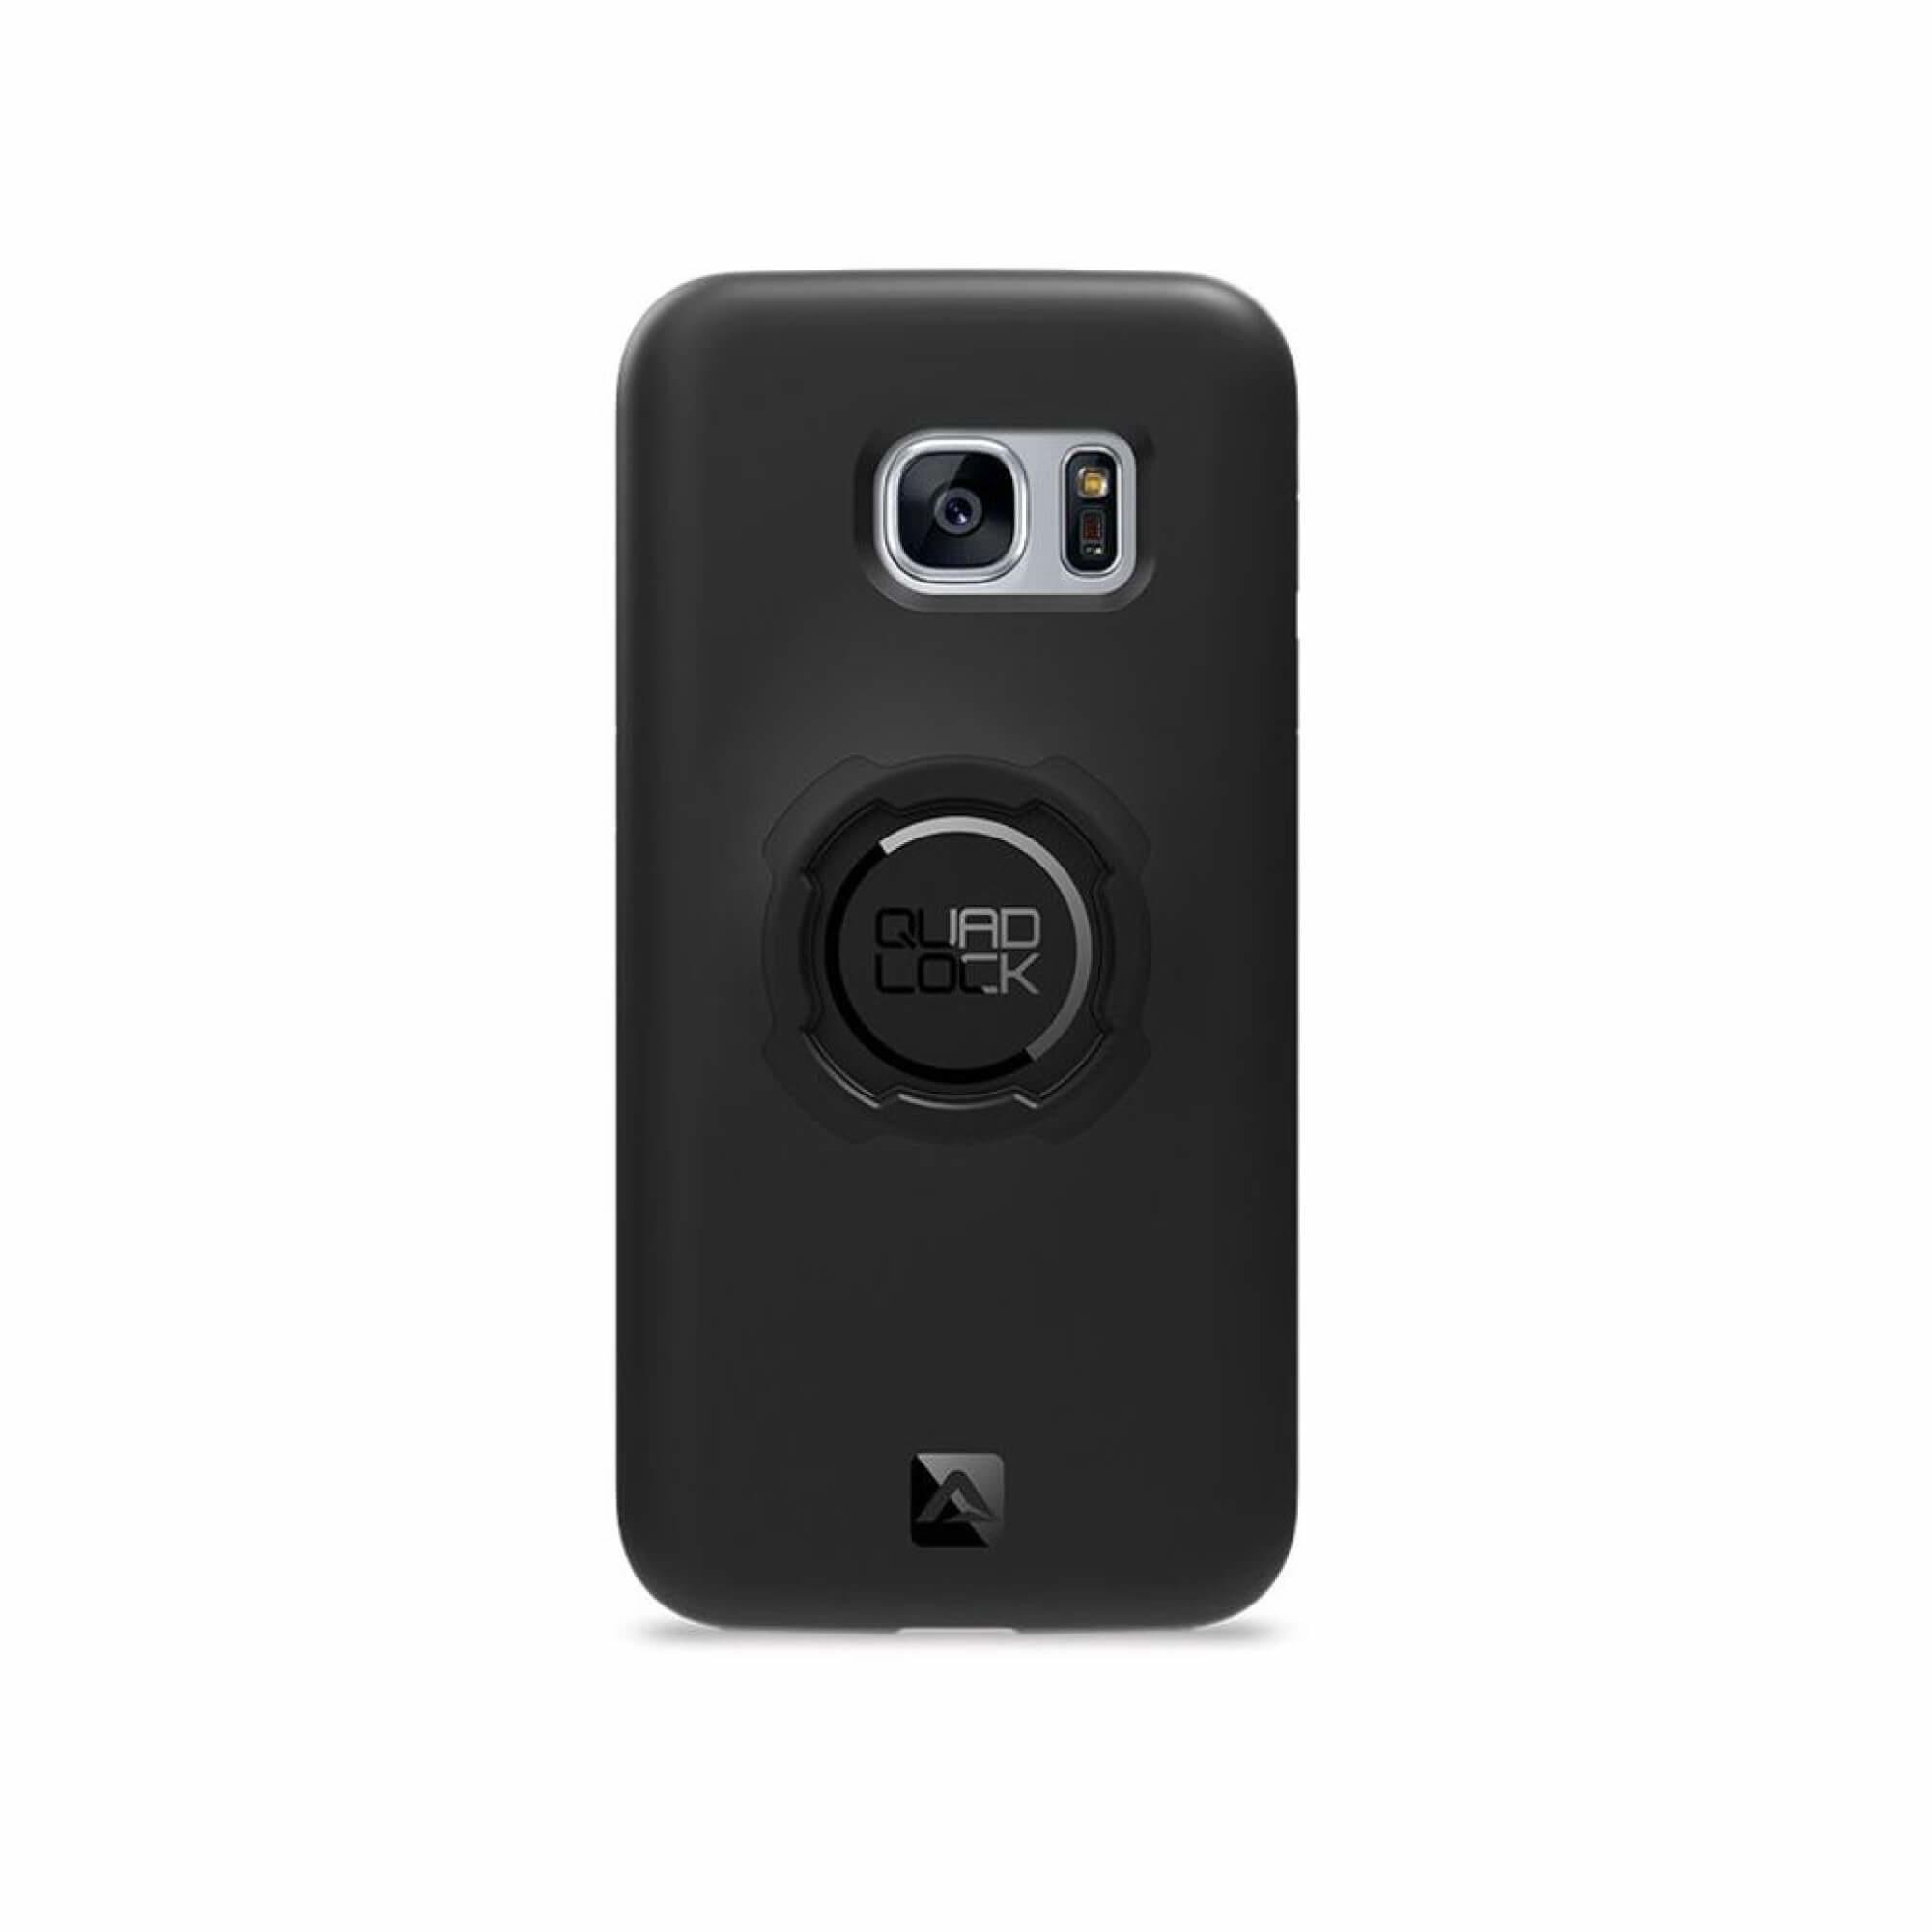 Case Galaxy S7 Edge-1